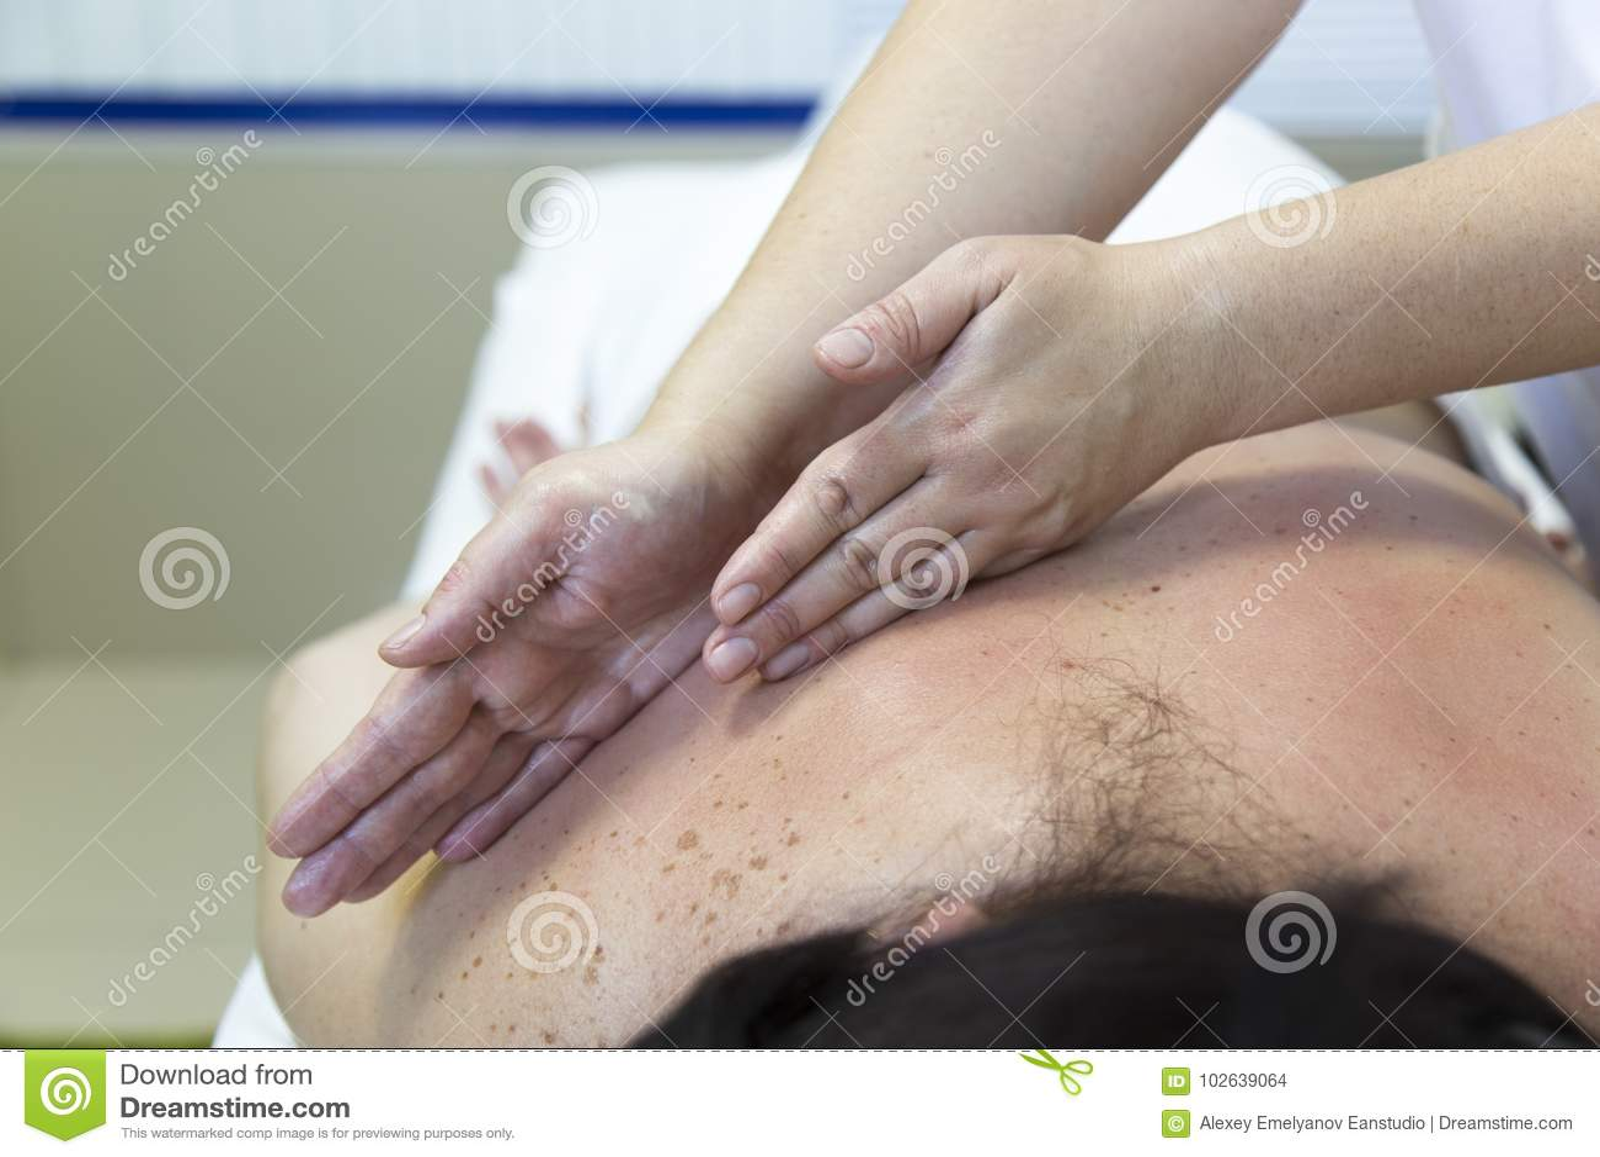 Massage women`s shoulders and waist.